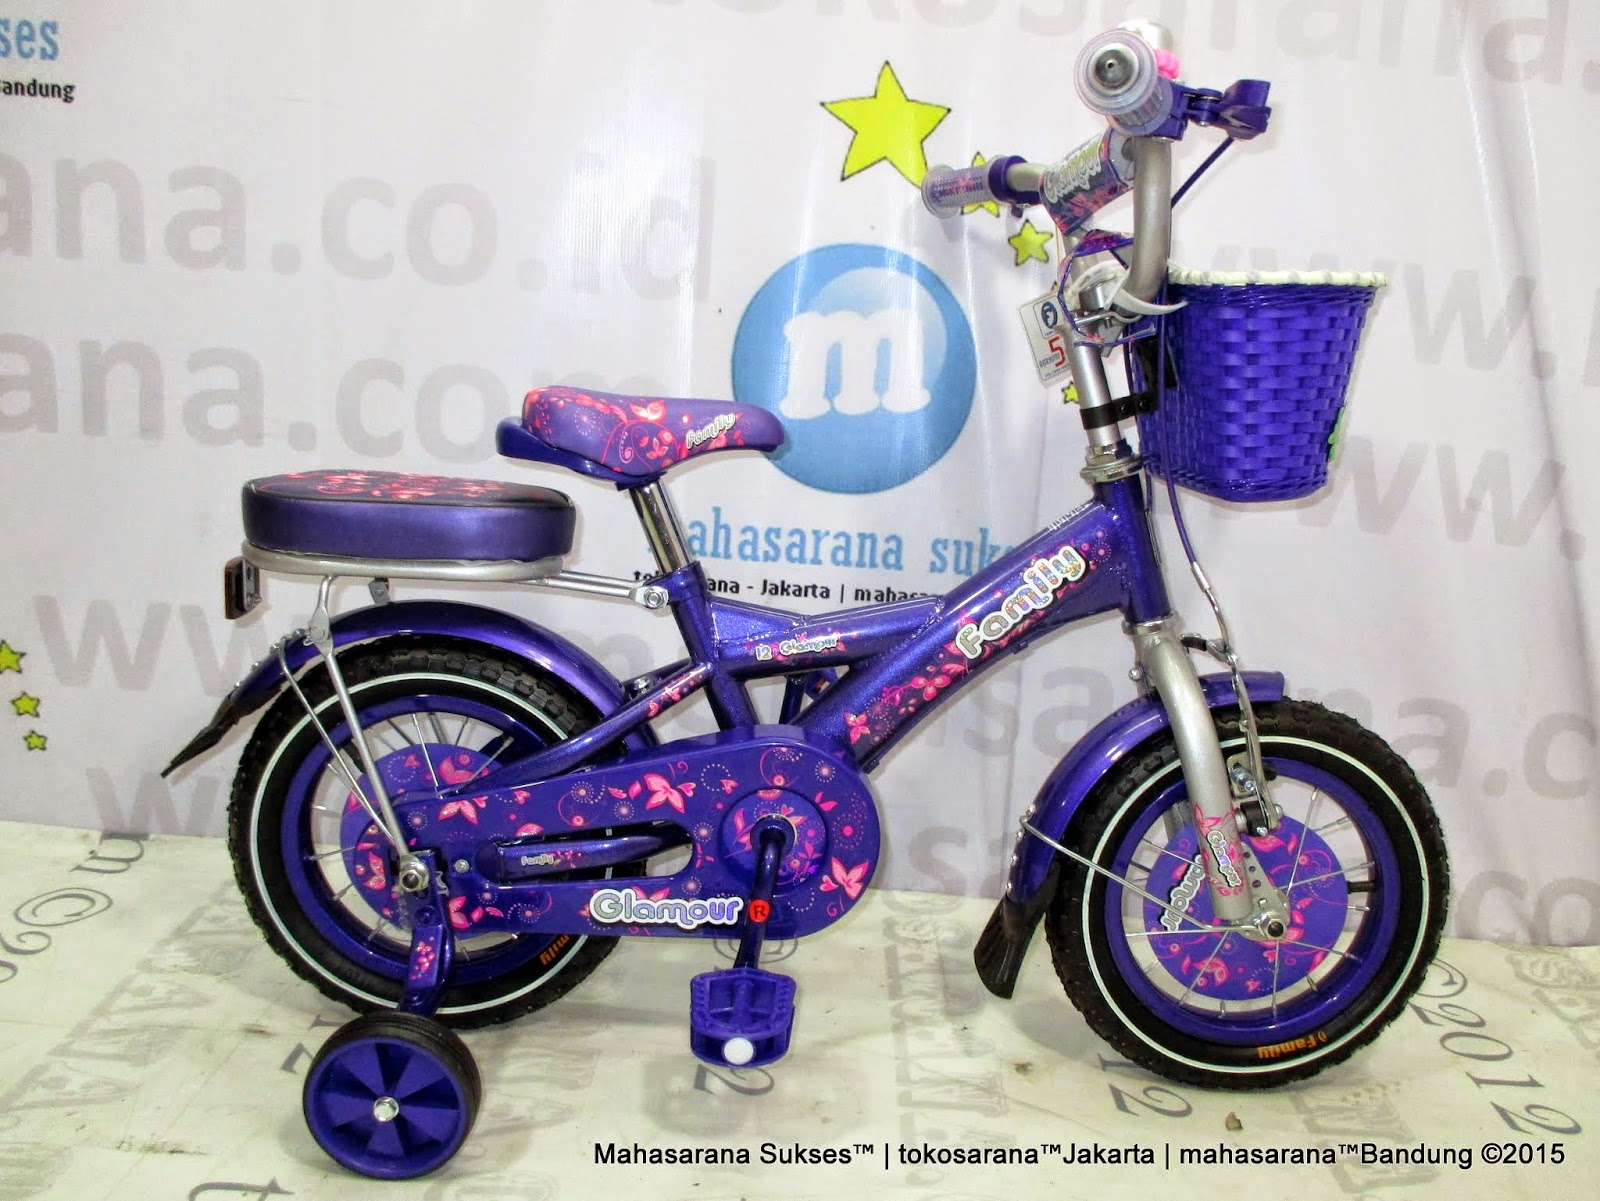 tokosarana™Jakarta Jatinegara: Sepeda Anak Family Glitter